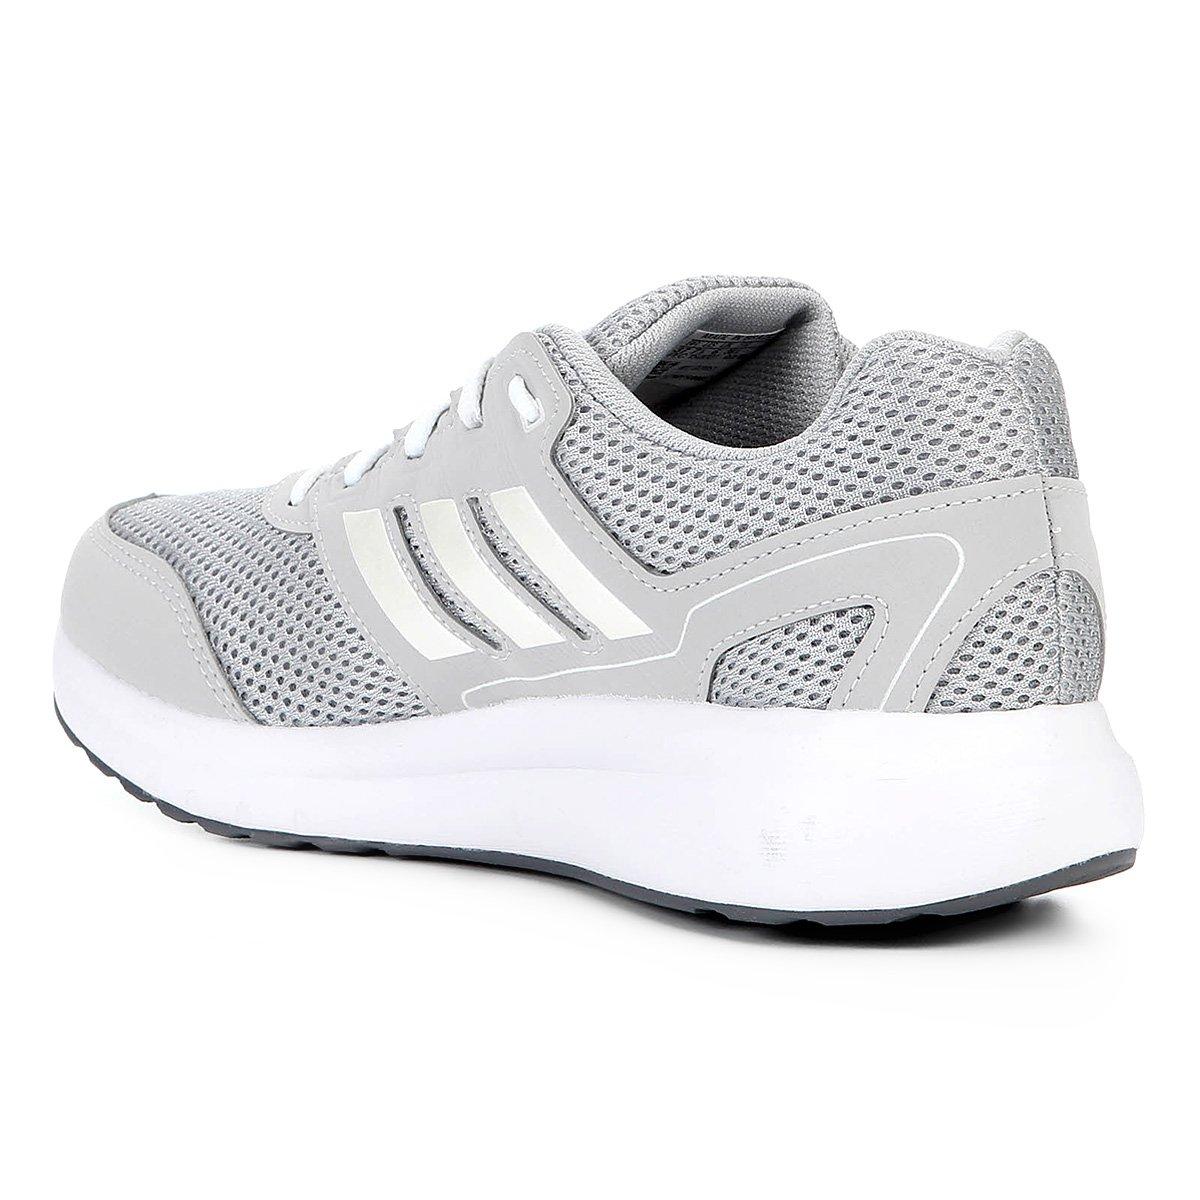 Tênis Adidas Duramo Lite 2 0 Feminino Chumbo e Branco